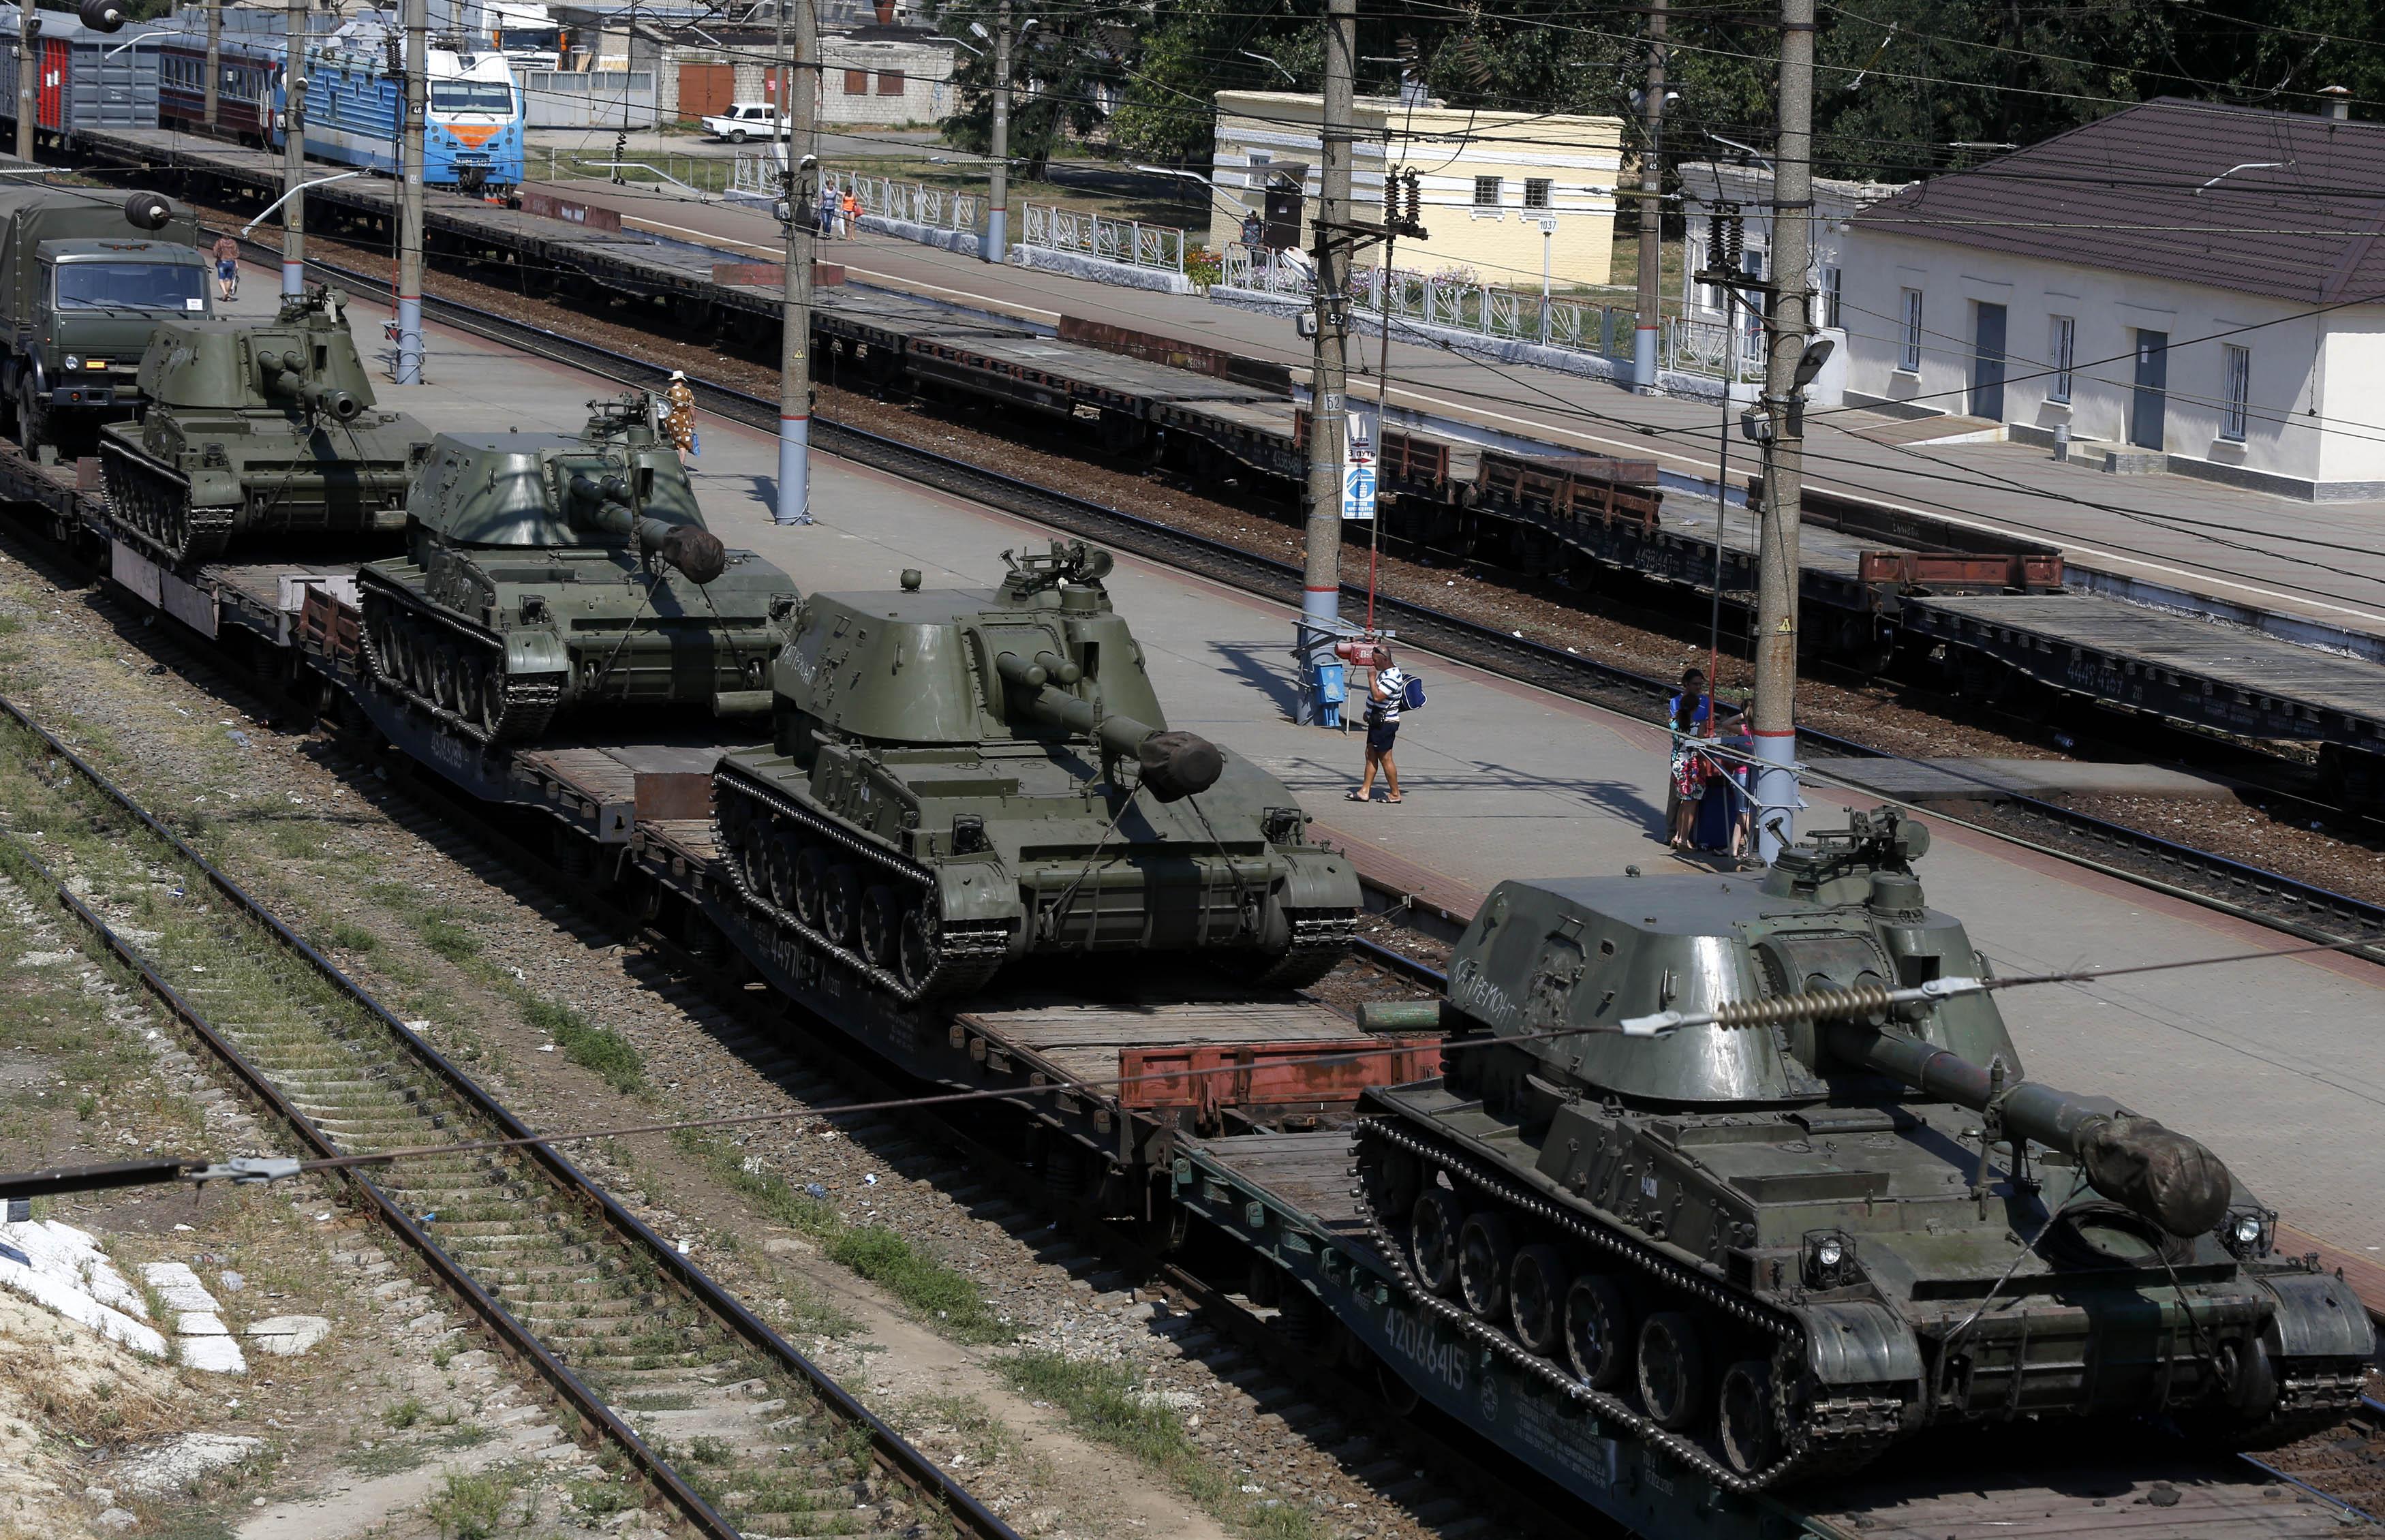 Esercitazioni russo-bielorusse al via vicino ai confini Ue